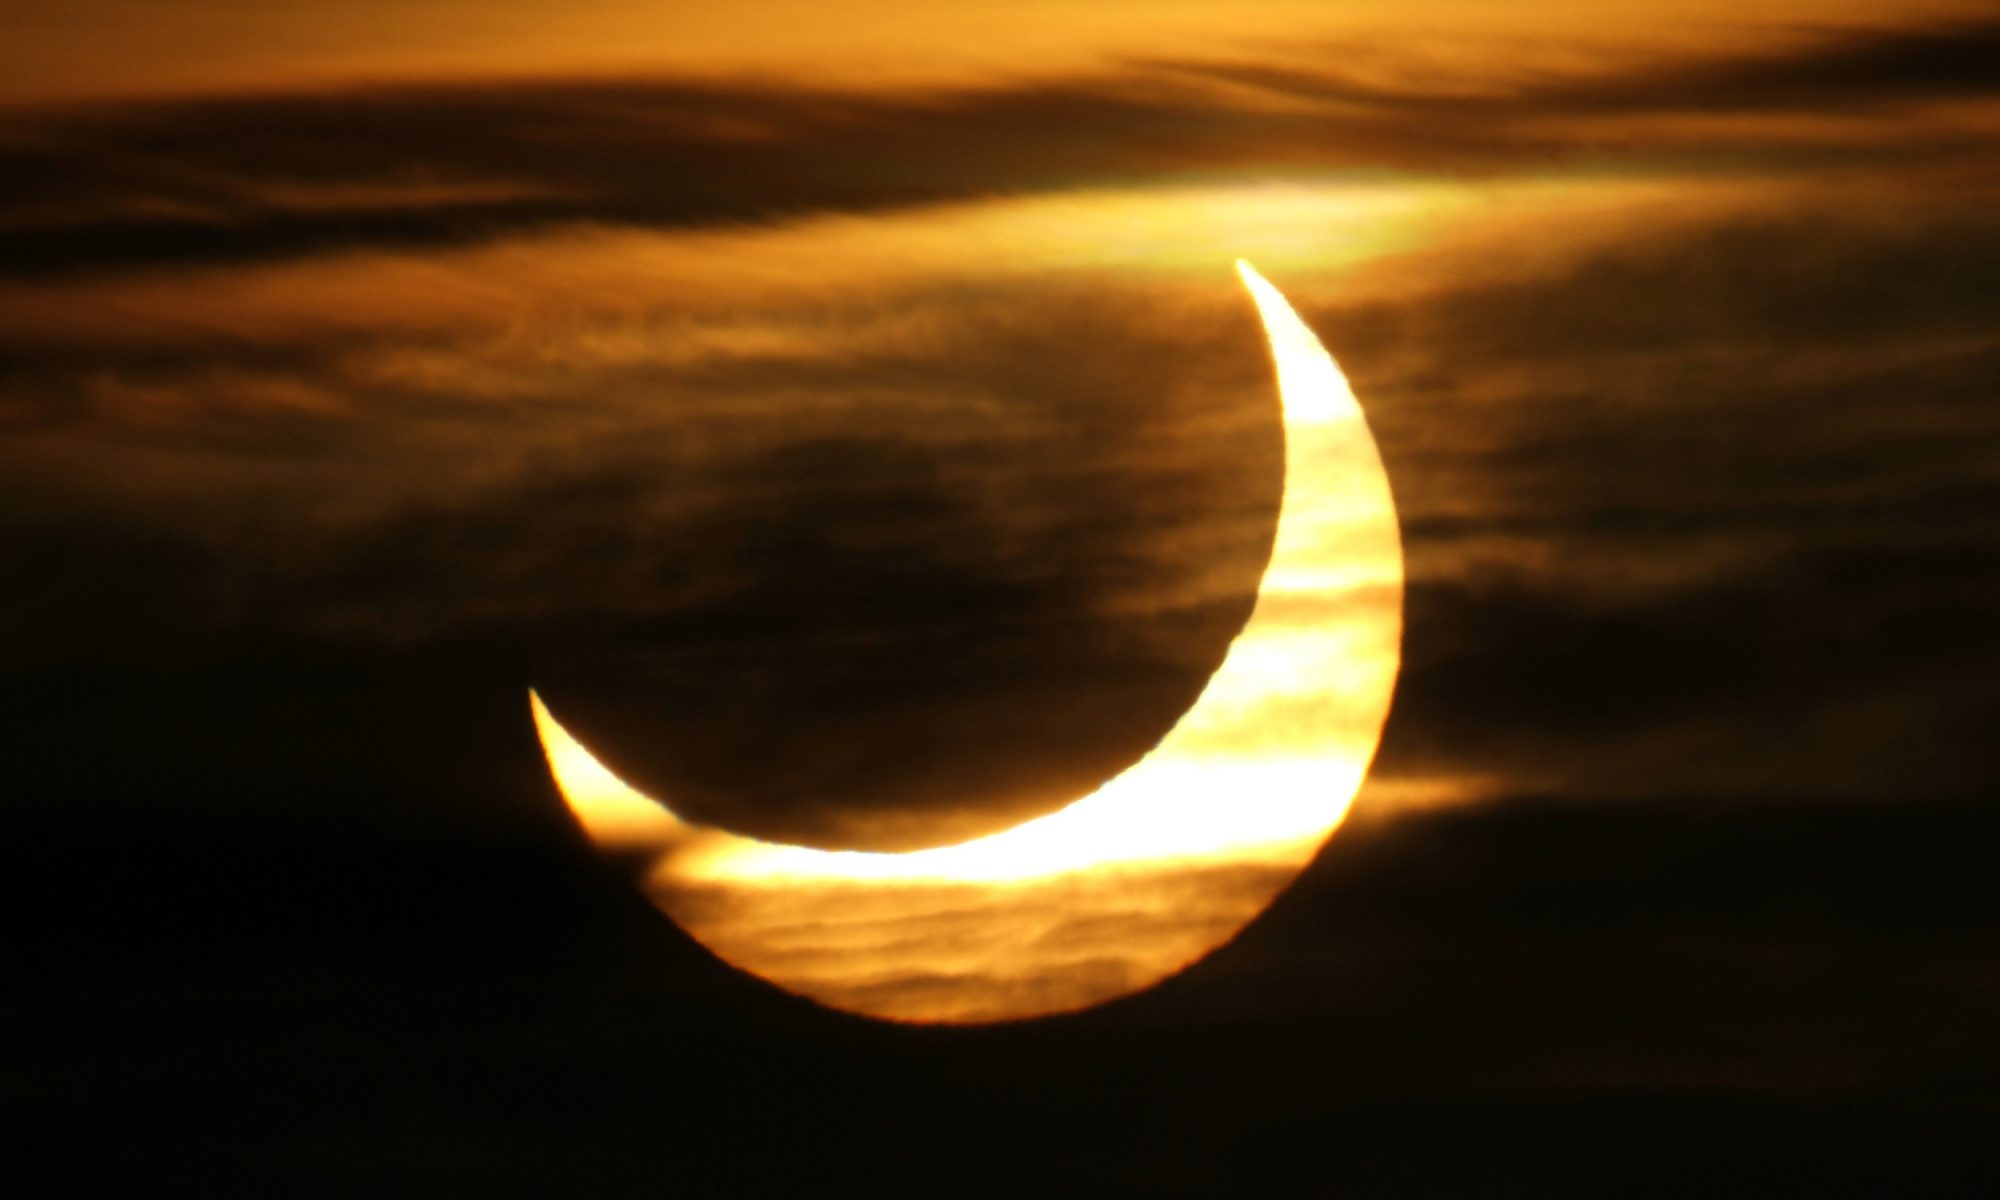 solar eclipse moon